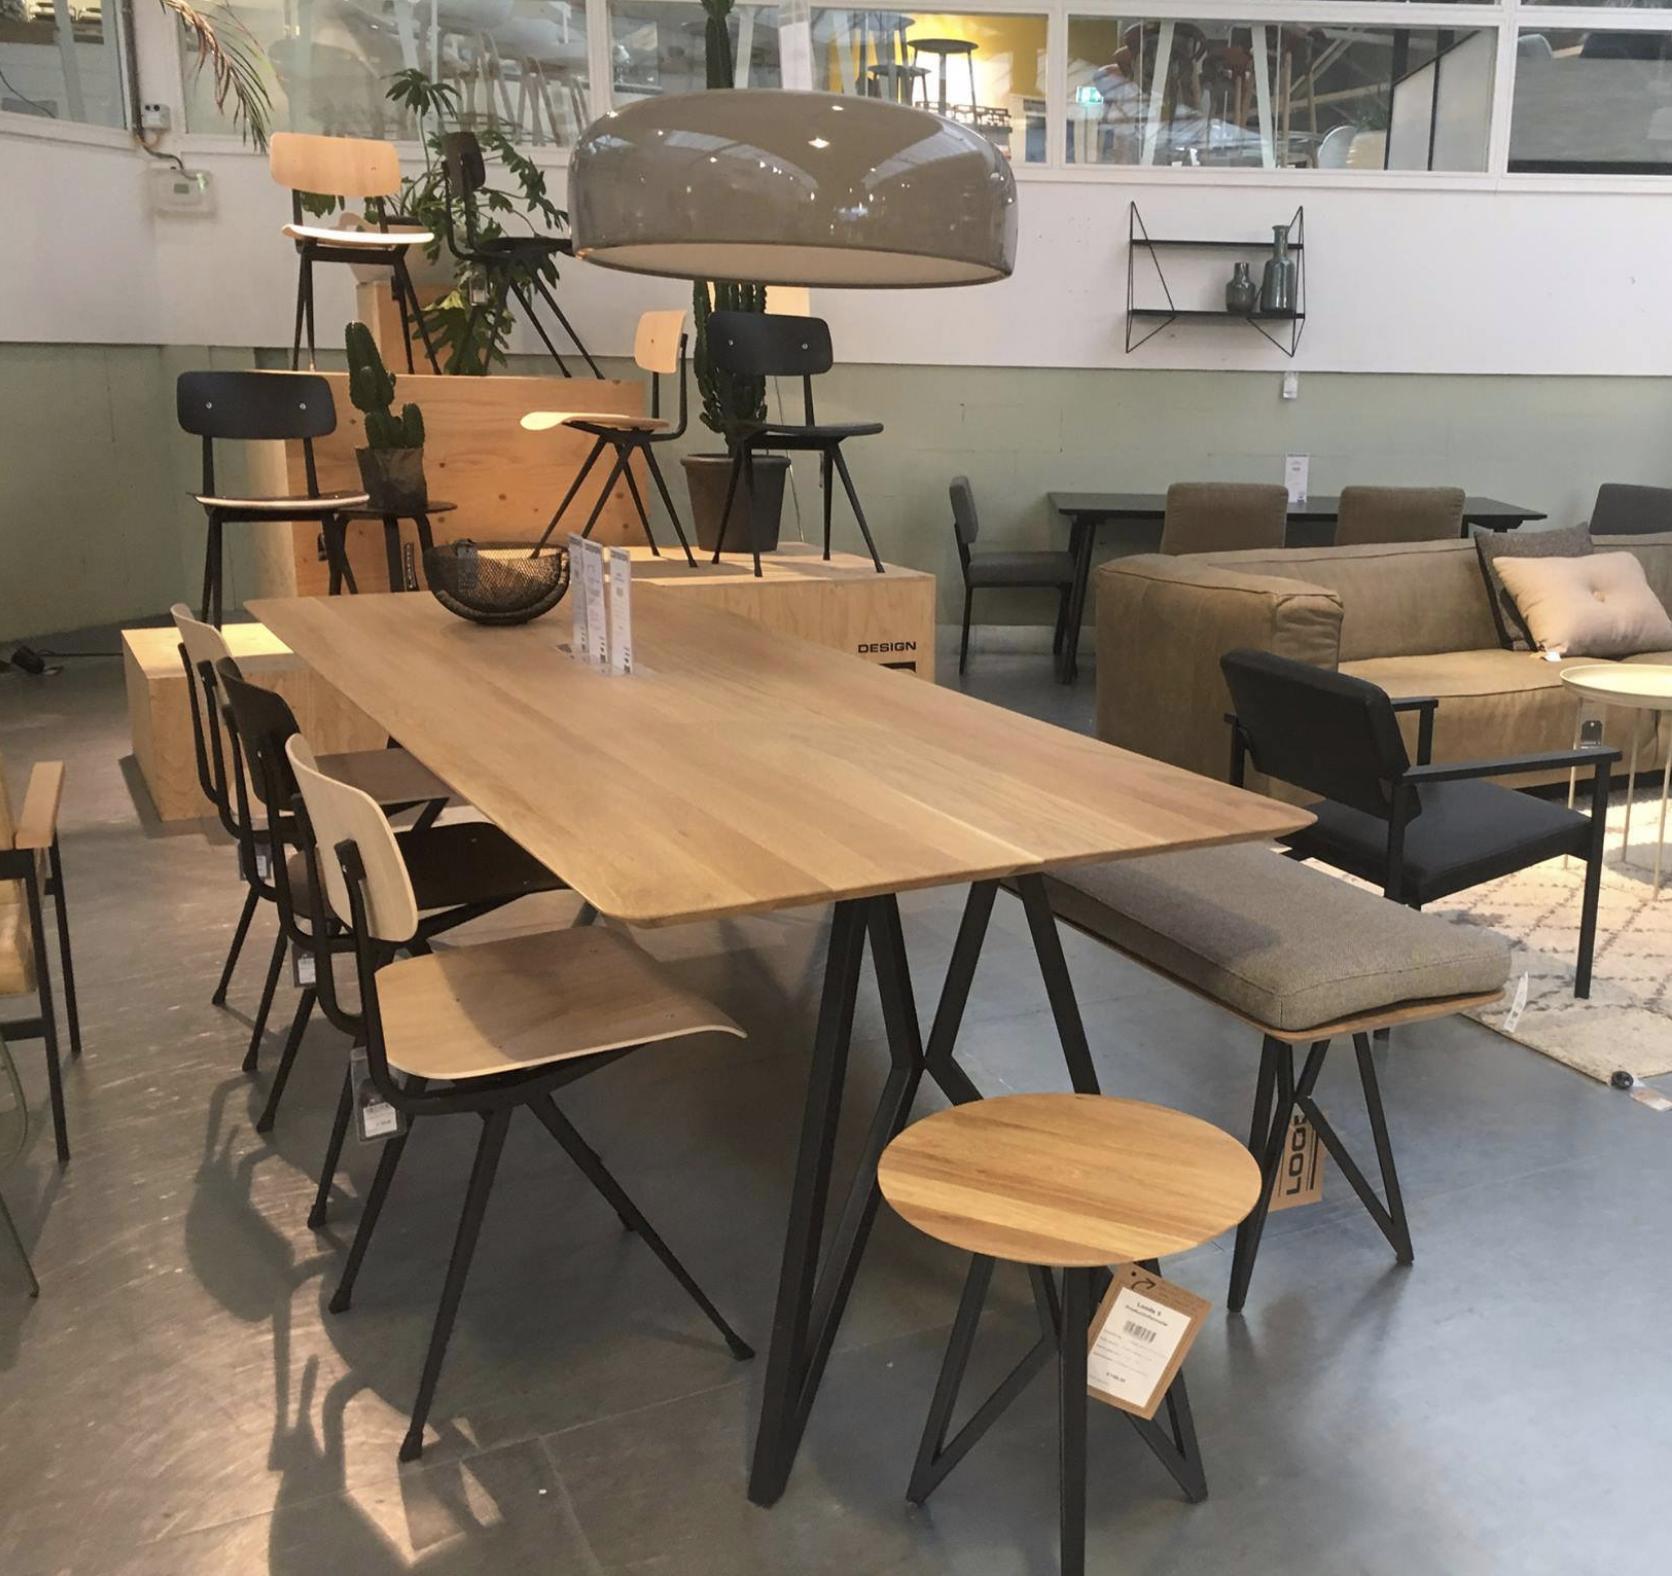 Butterfly tafel kruk bankje vlinder Loods5 | Studio H&K | Design ...